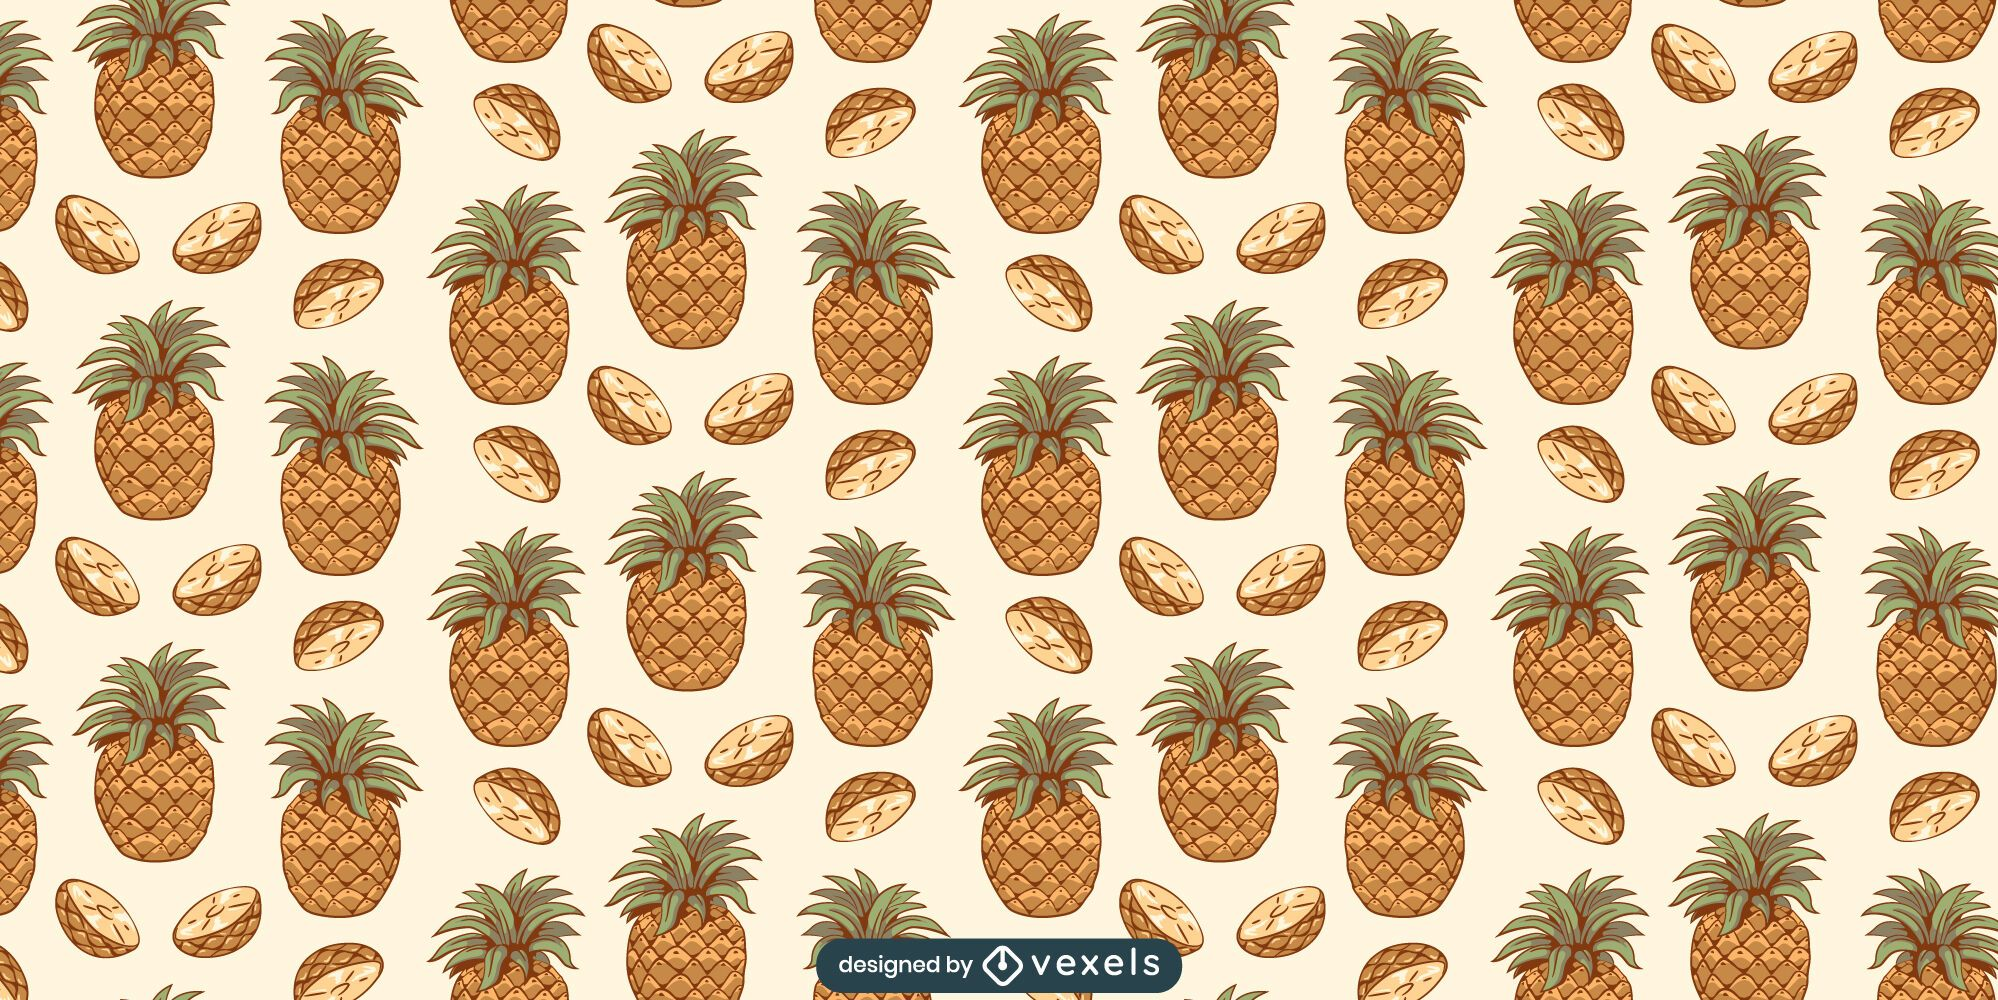 Pineapple slices pattern design